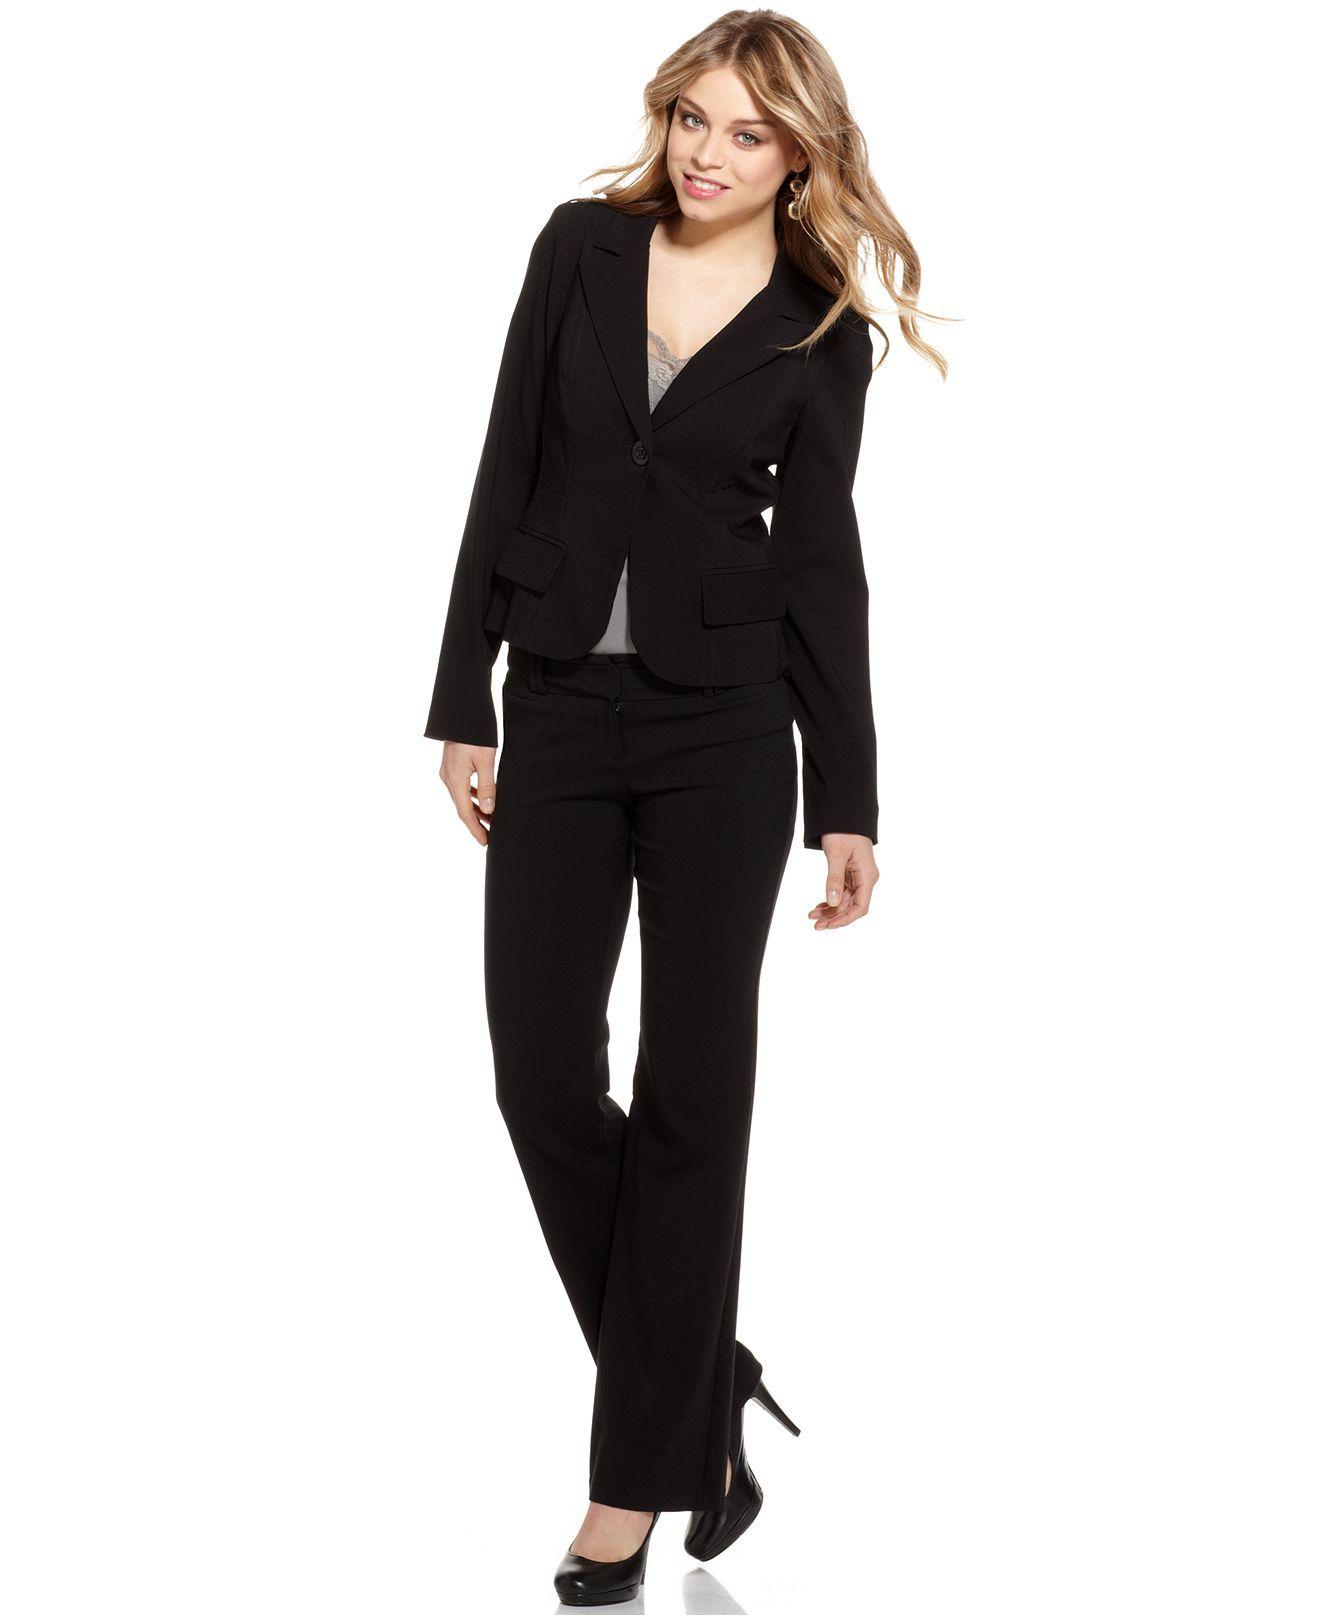 Xoxo Suit Jacket Pant Juniors Macys Professional Wear Business Fashion